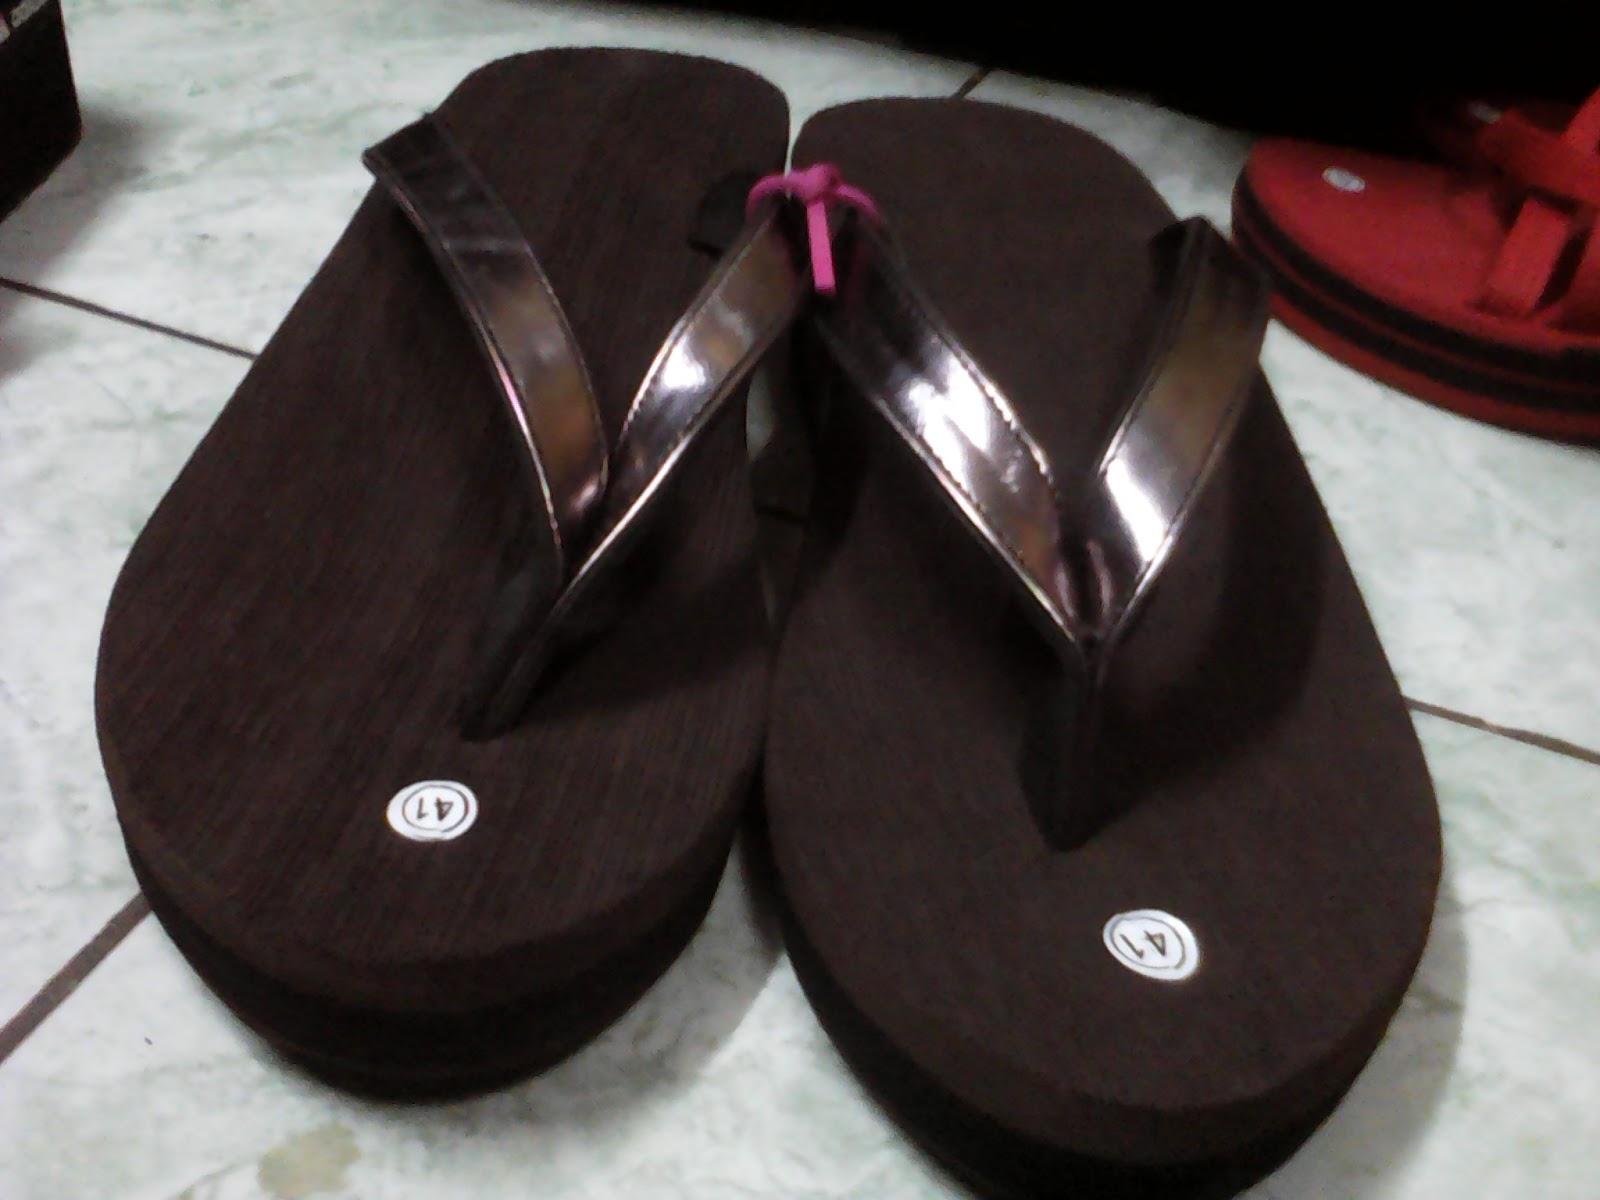 Sandal Wanita Tinggi 5cm Harga Kisaran Rp S d Disesuaikan dengan jumlah pesanan